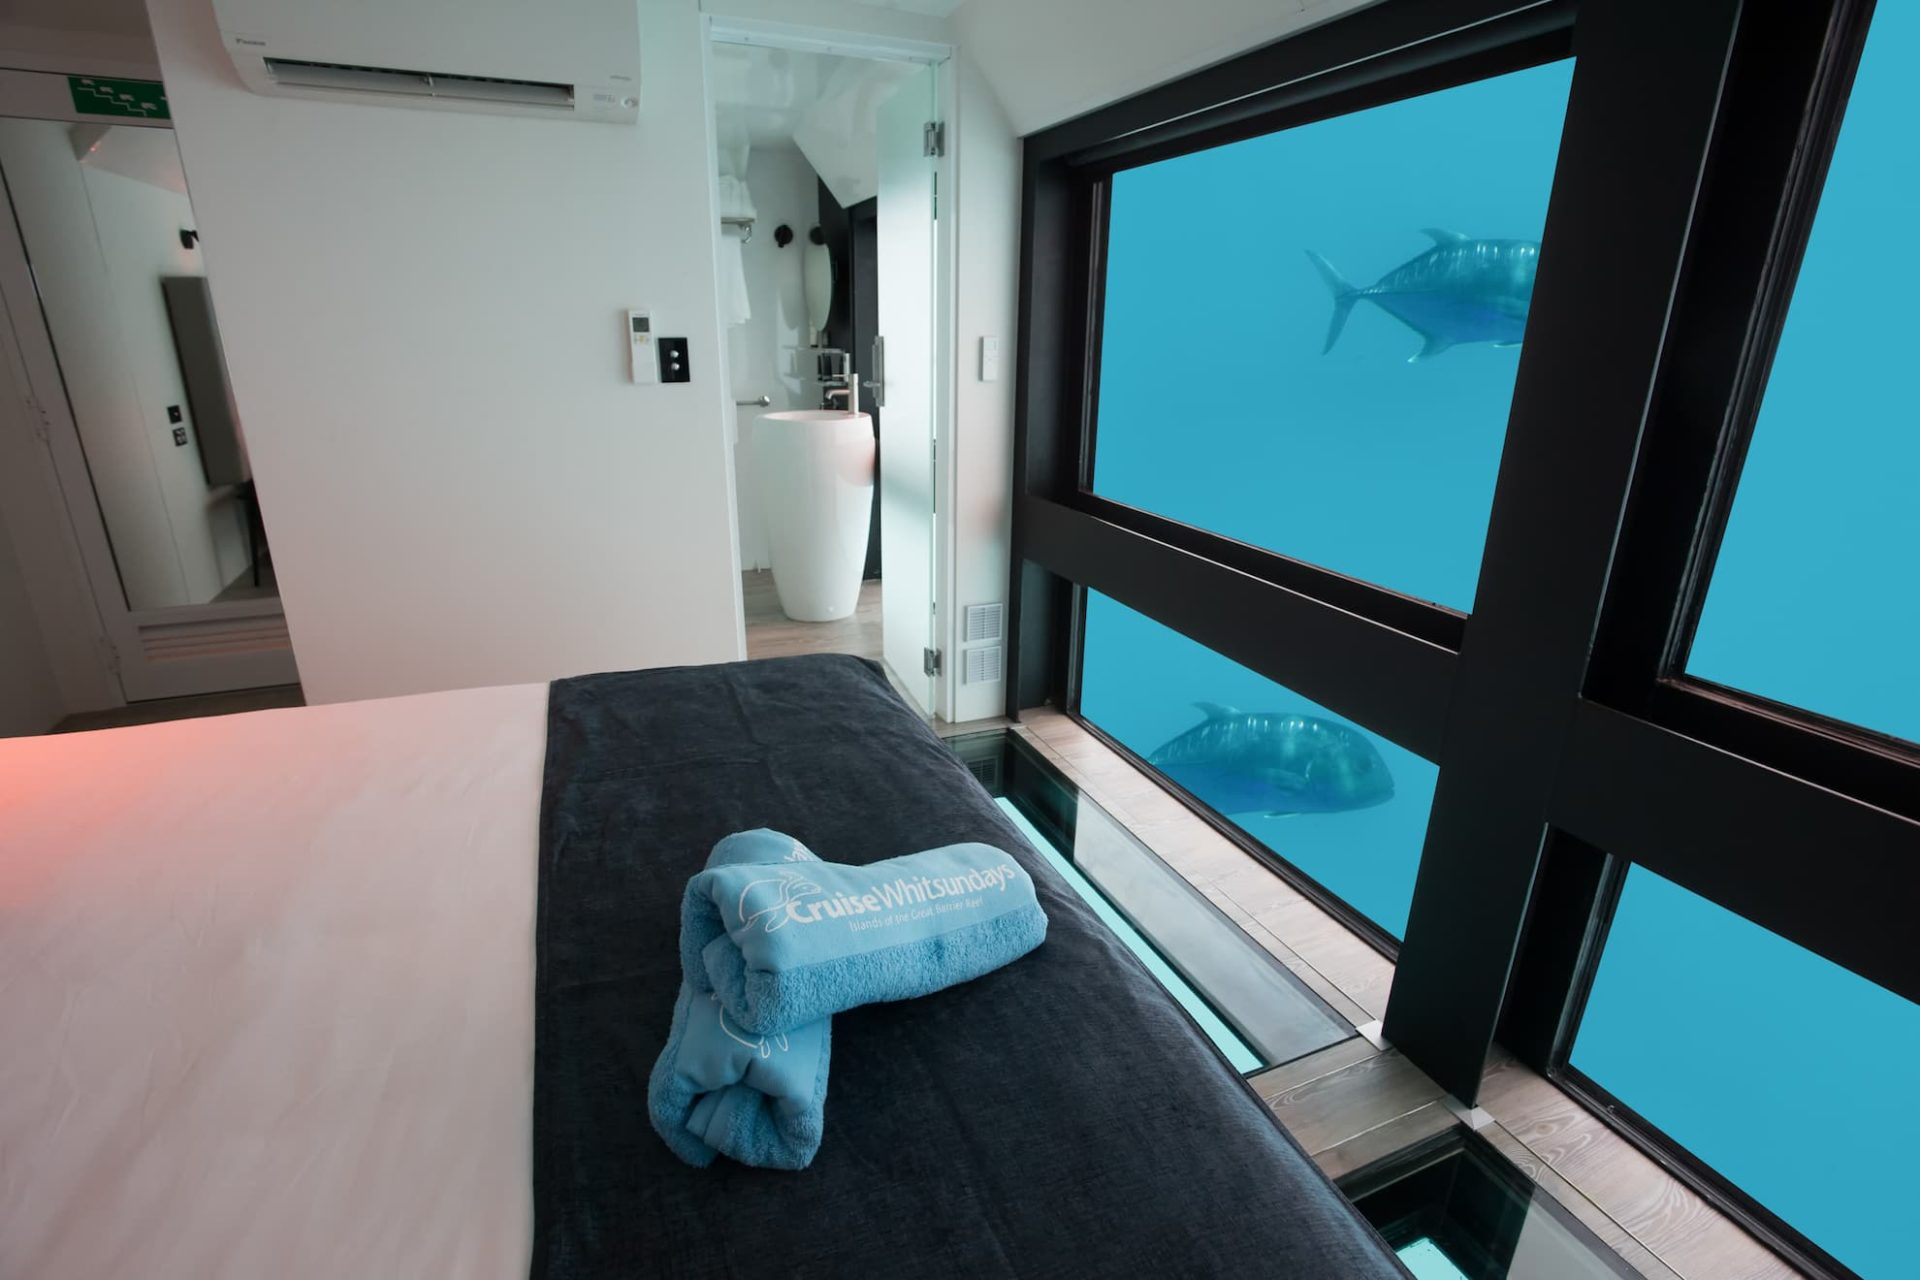 Australia's Great Barrier Reef hosts underwater hotel's reef suites